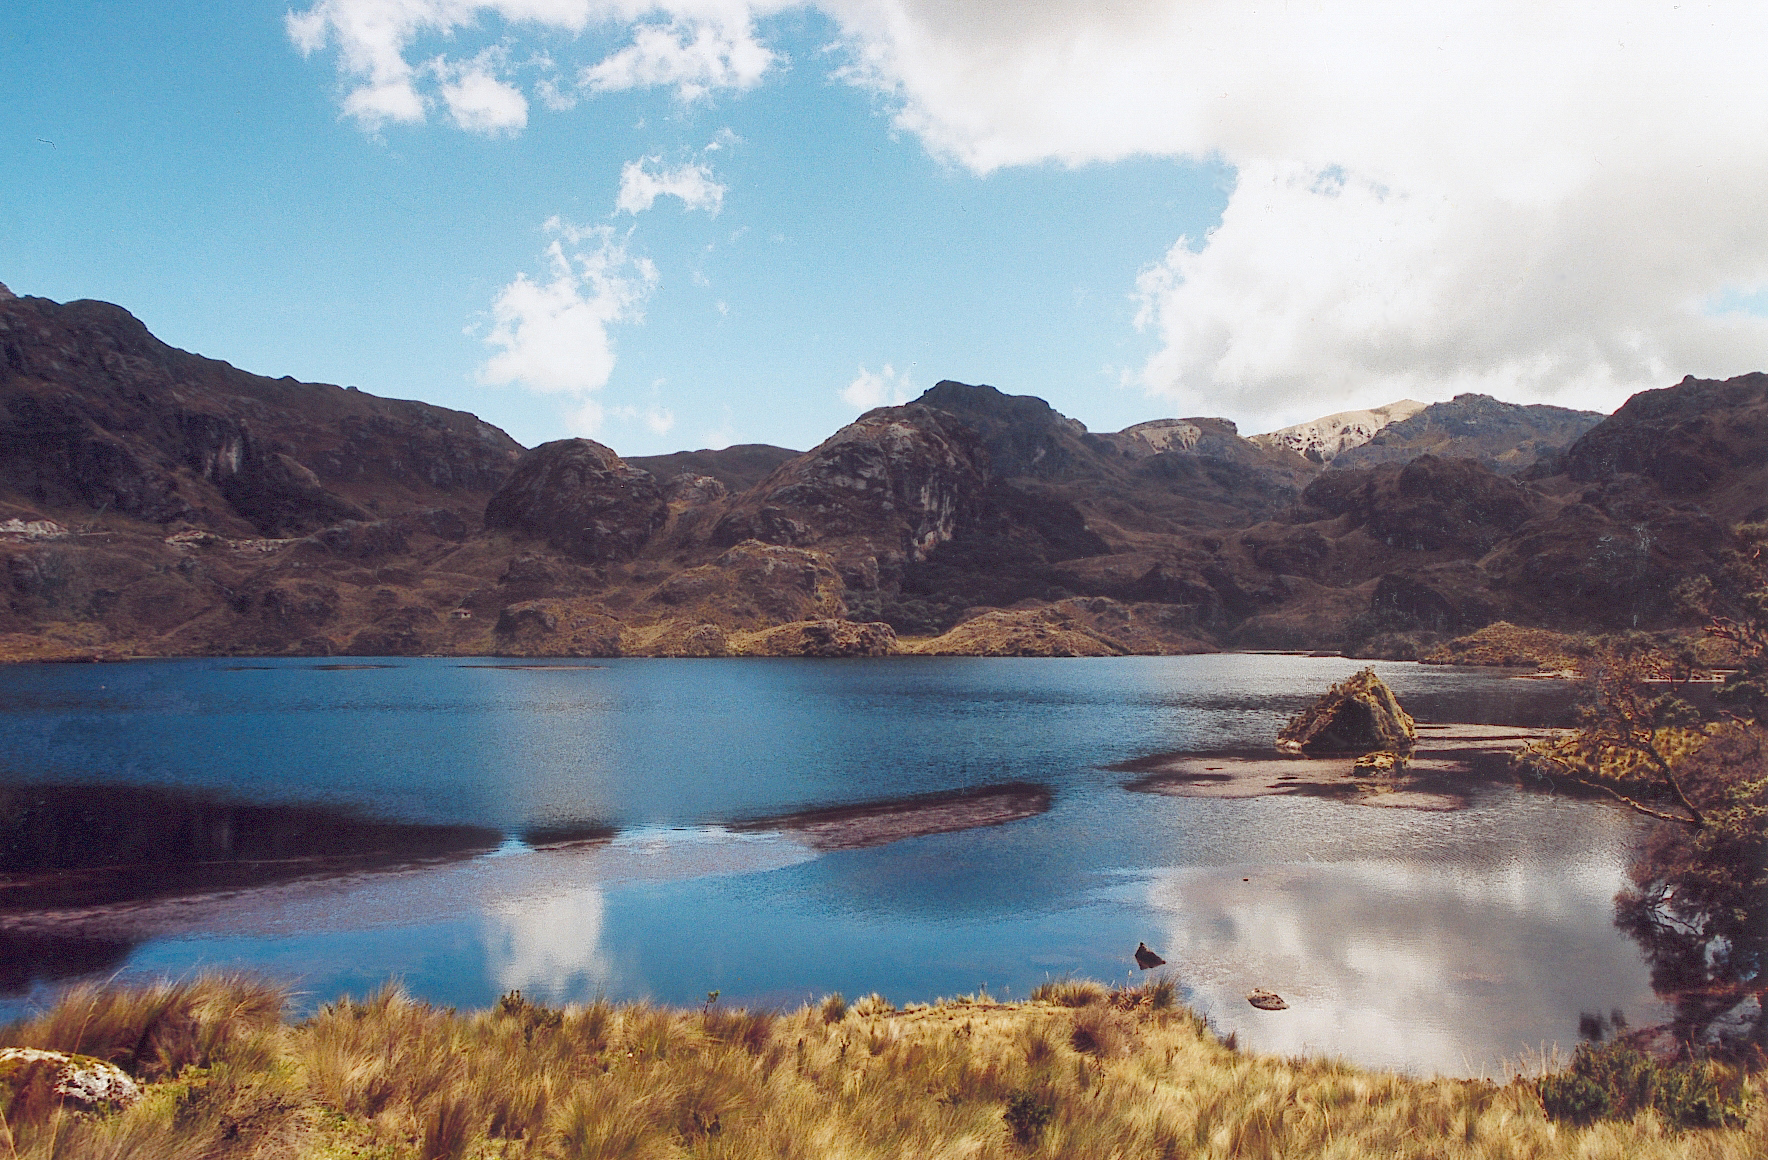 bio diversity and natural beauty in Ecuador